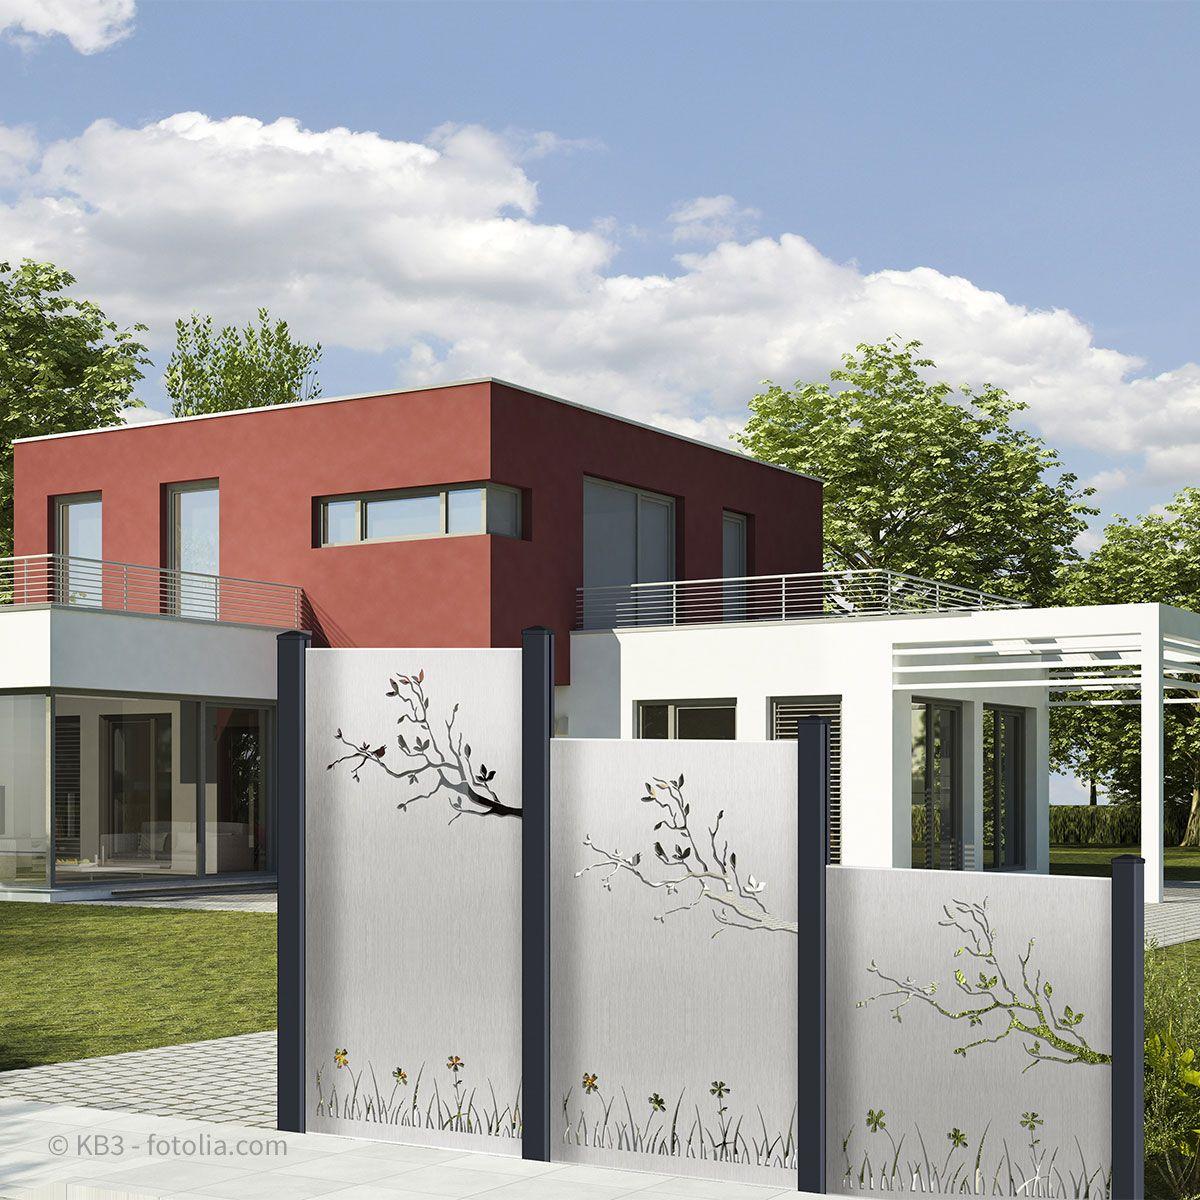 Design Edelstahl Blechfullung Motiv Ast Wiese Sichtschutz